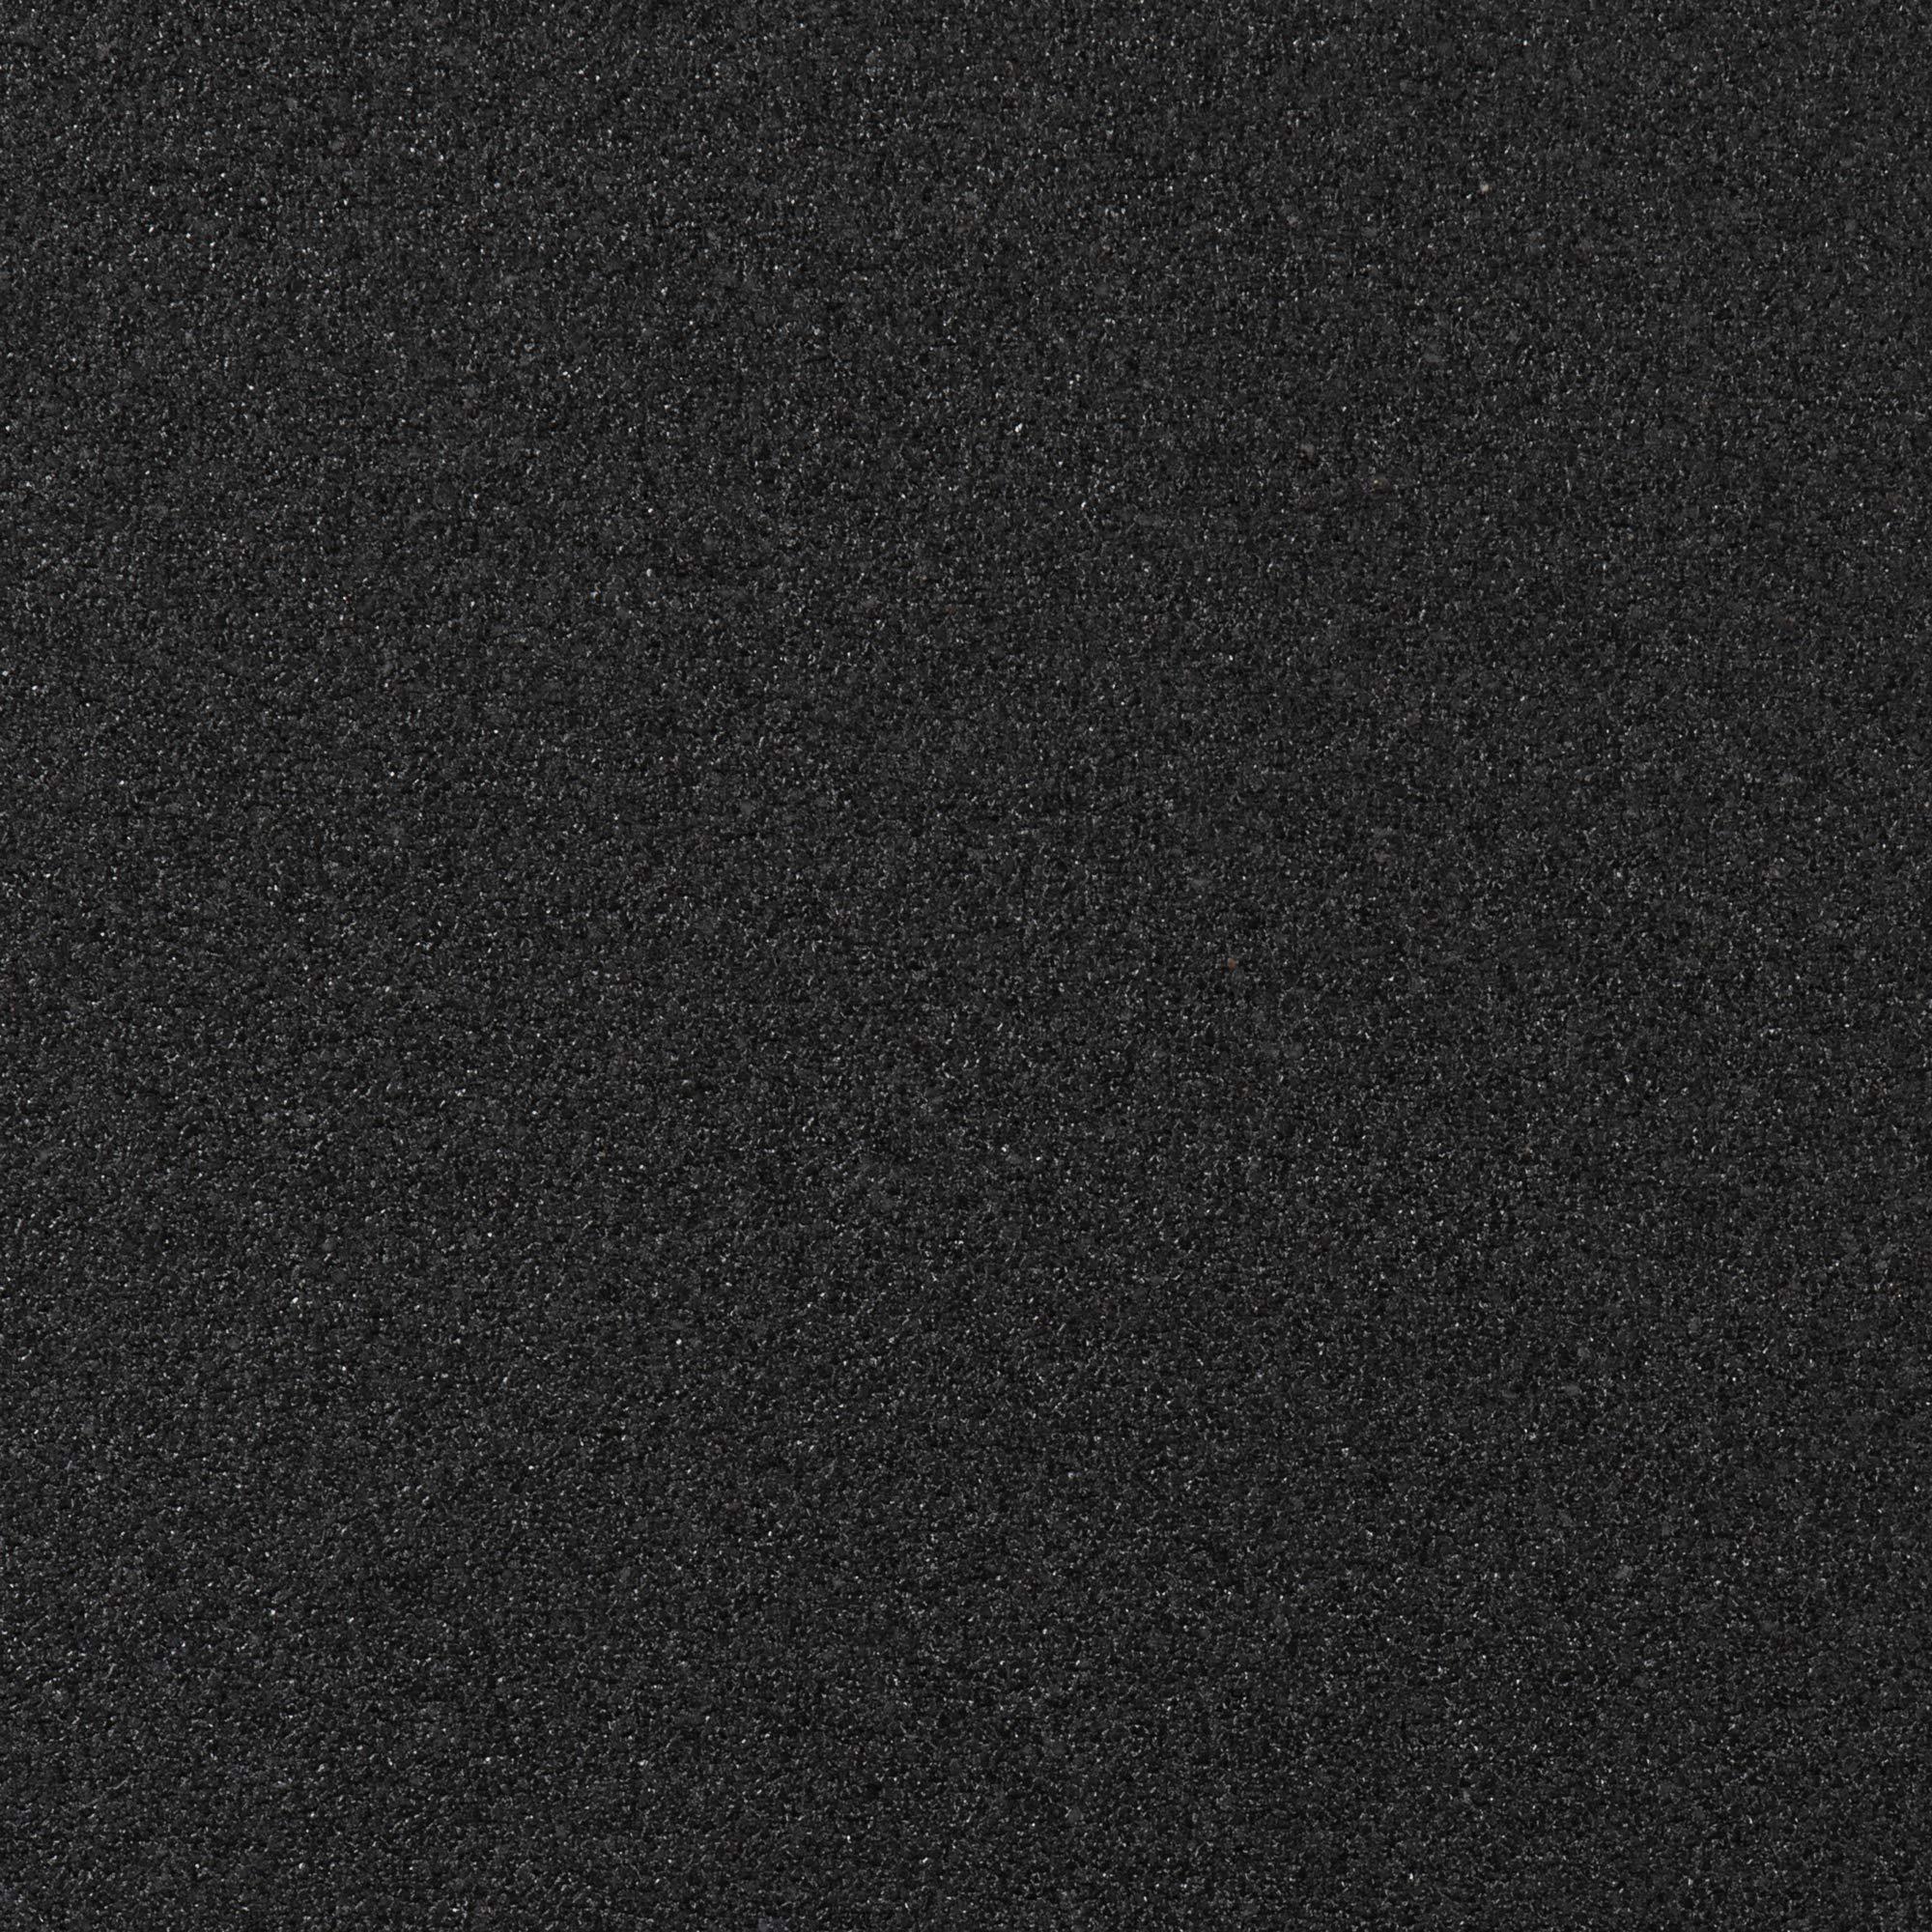 Ruvati 33 x 22 inch Dual-Mount Granite Composite Single Bowl Kitchen Sink - Midnight Black - RVG1033BK by Ruvati (Image #5)